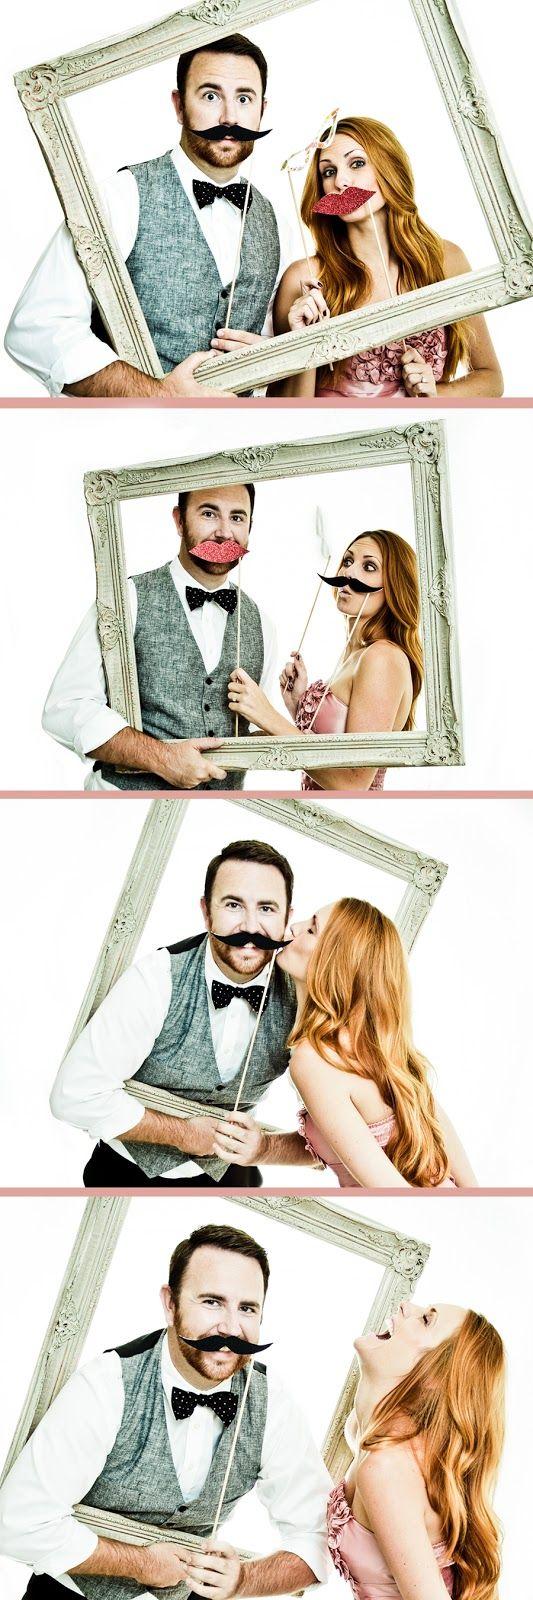 The Freebird Blog: Super Fun Photobooth Strip!